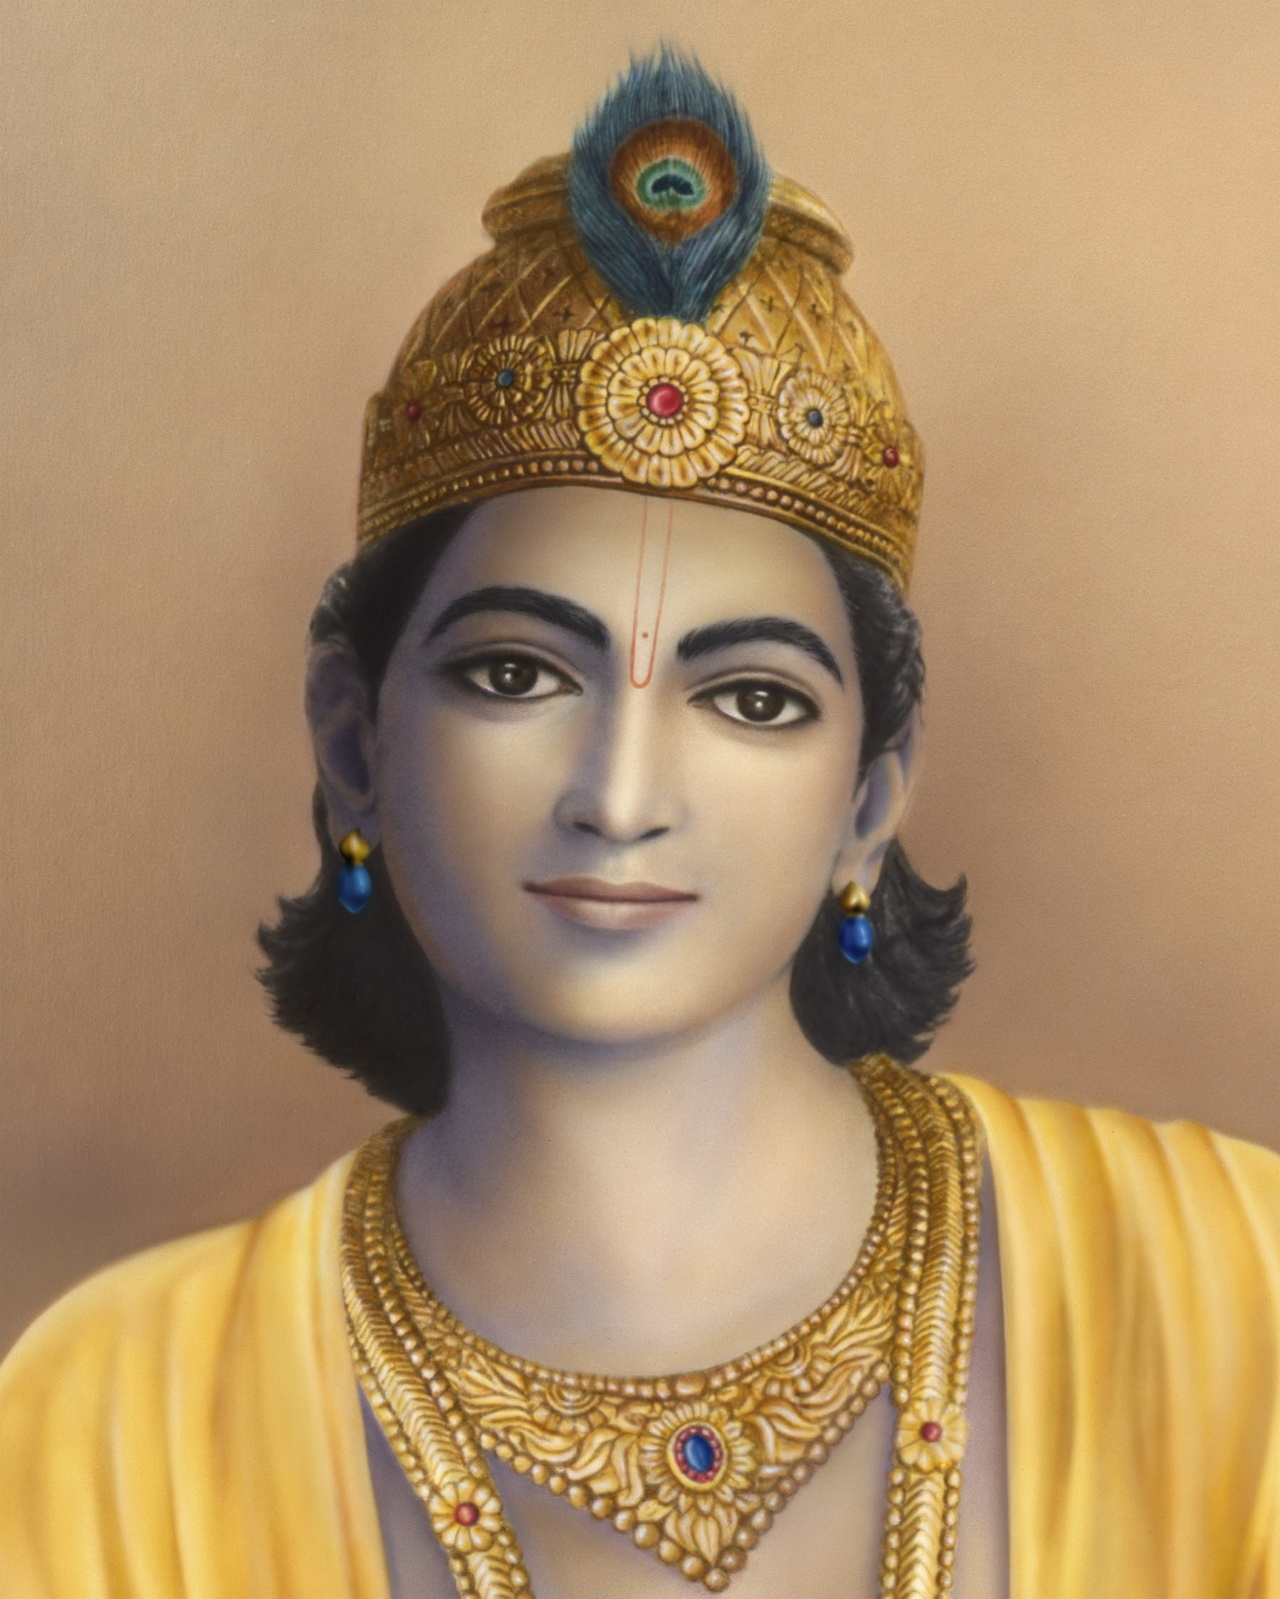 Bhagavan-Krishna-altar-image_1280-px-wide.jpg#asset:14896